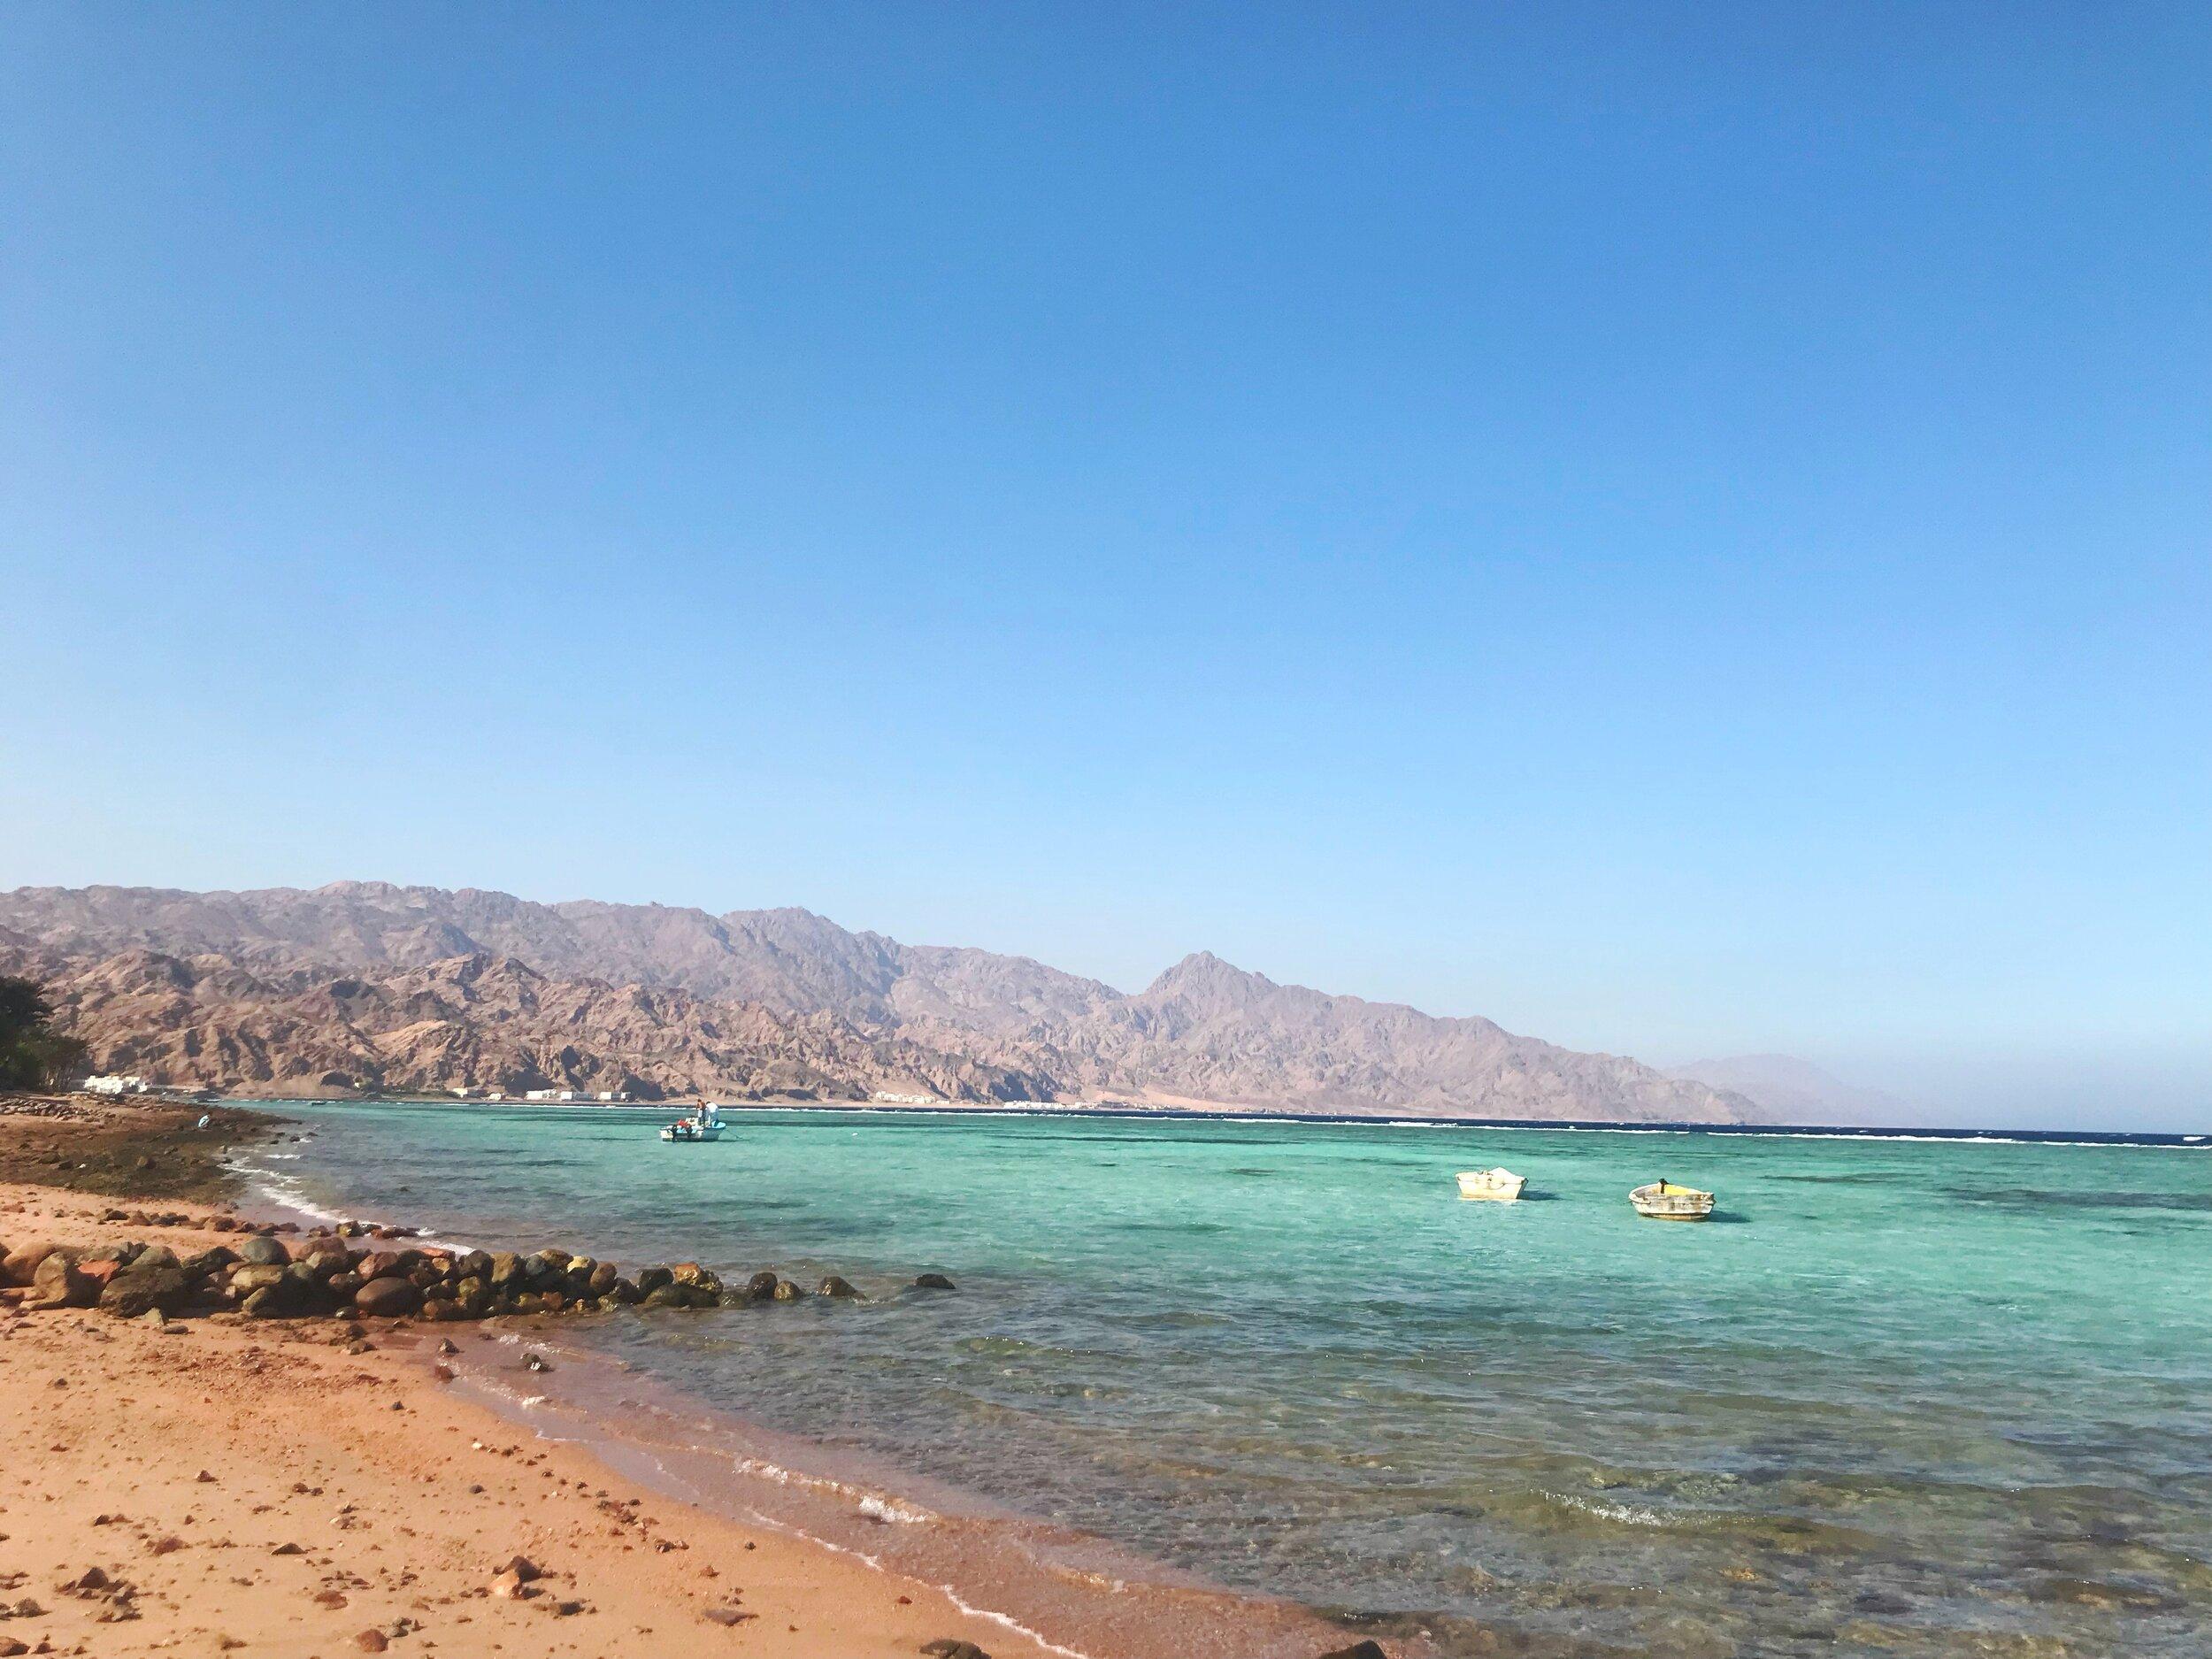 hotels-in-dahab-egypt-family-travel-blogger-negra-bohemian